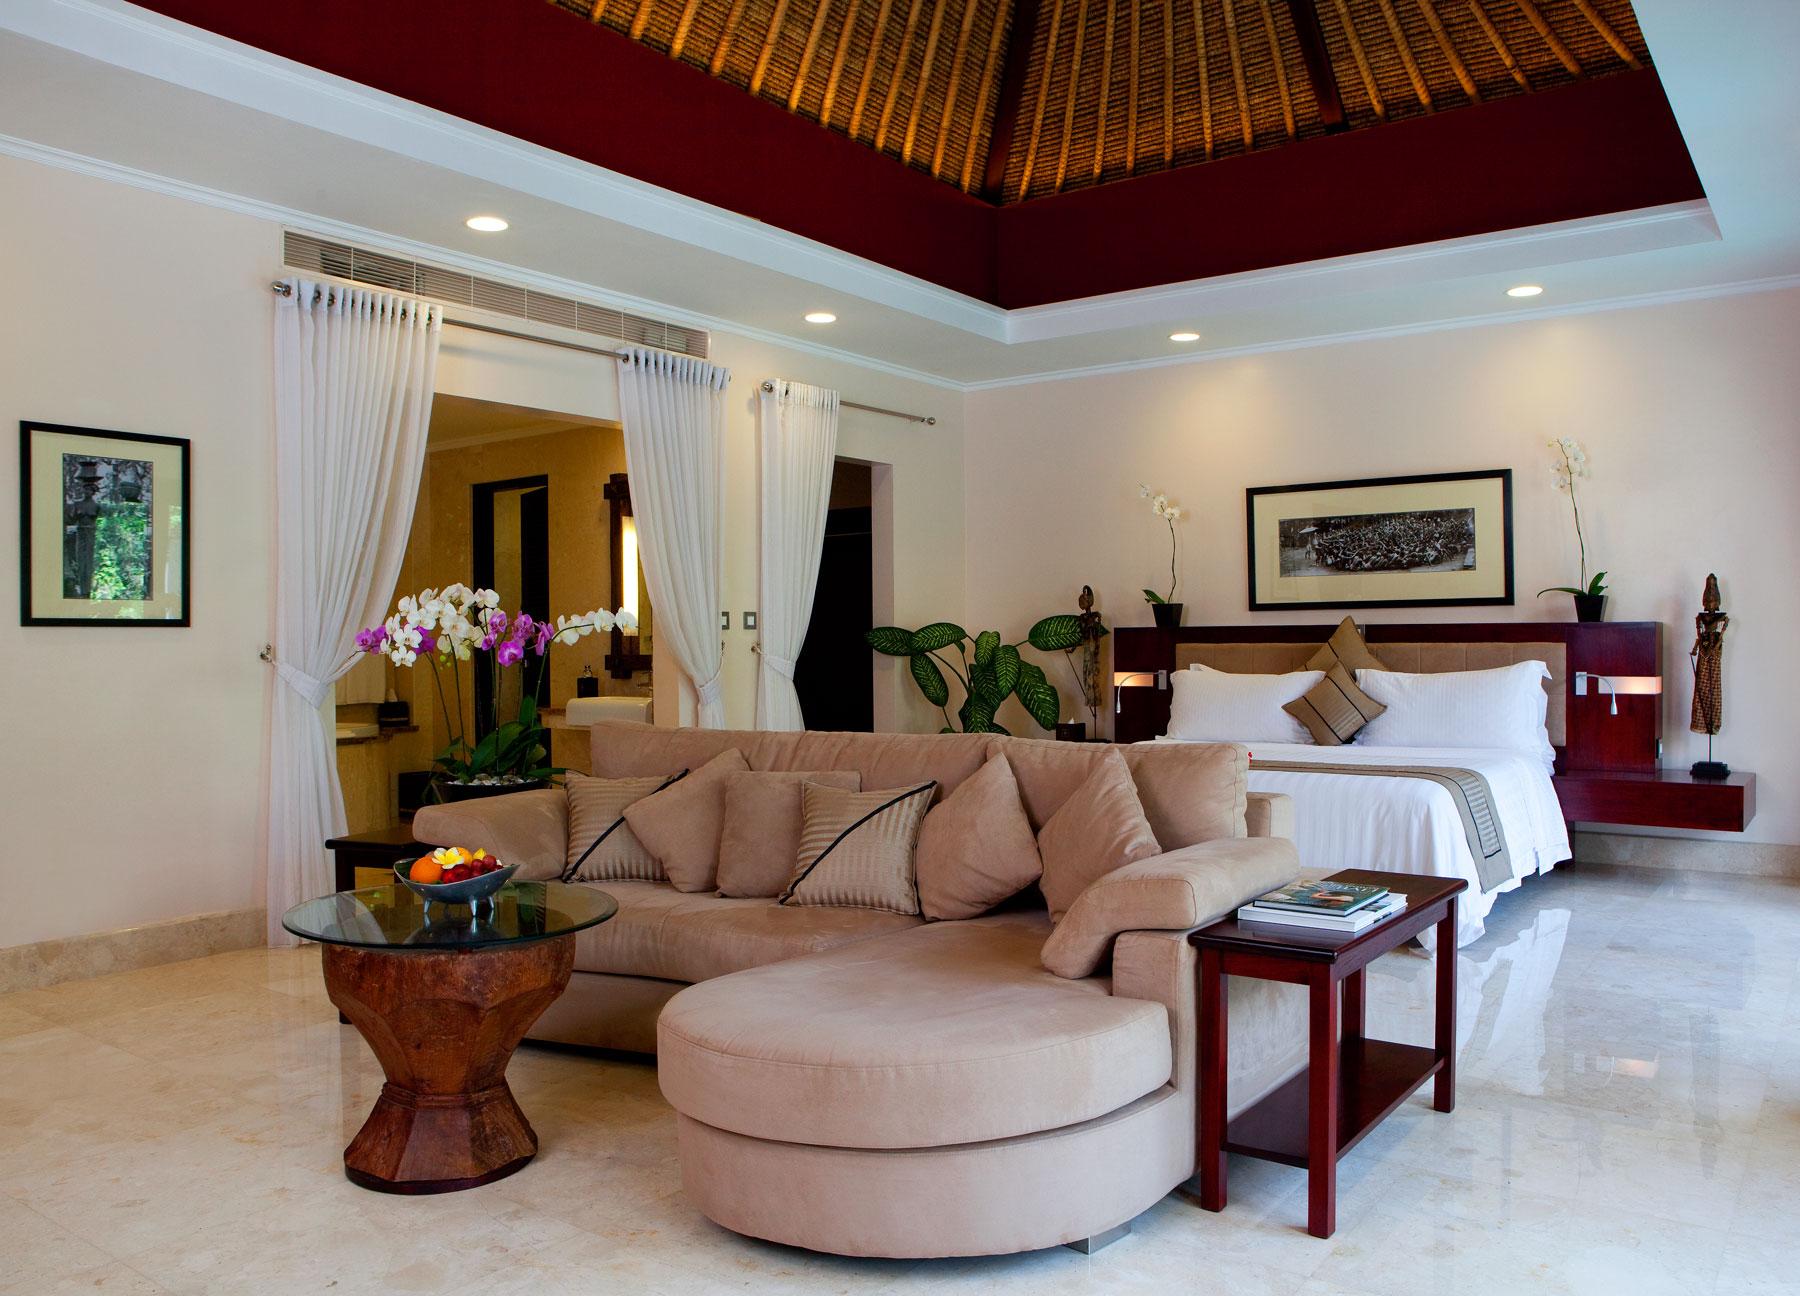 Viceroy Bali, a 5-Star Resort and Spa (41)